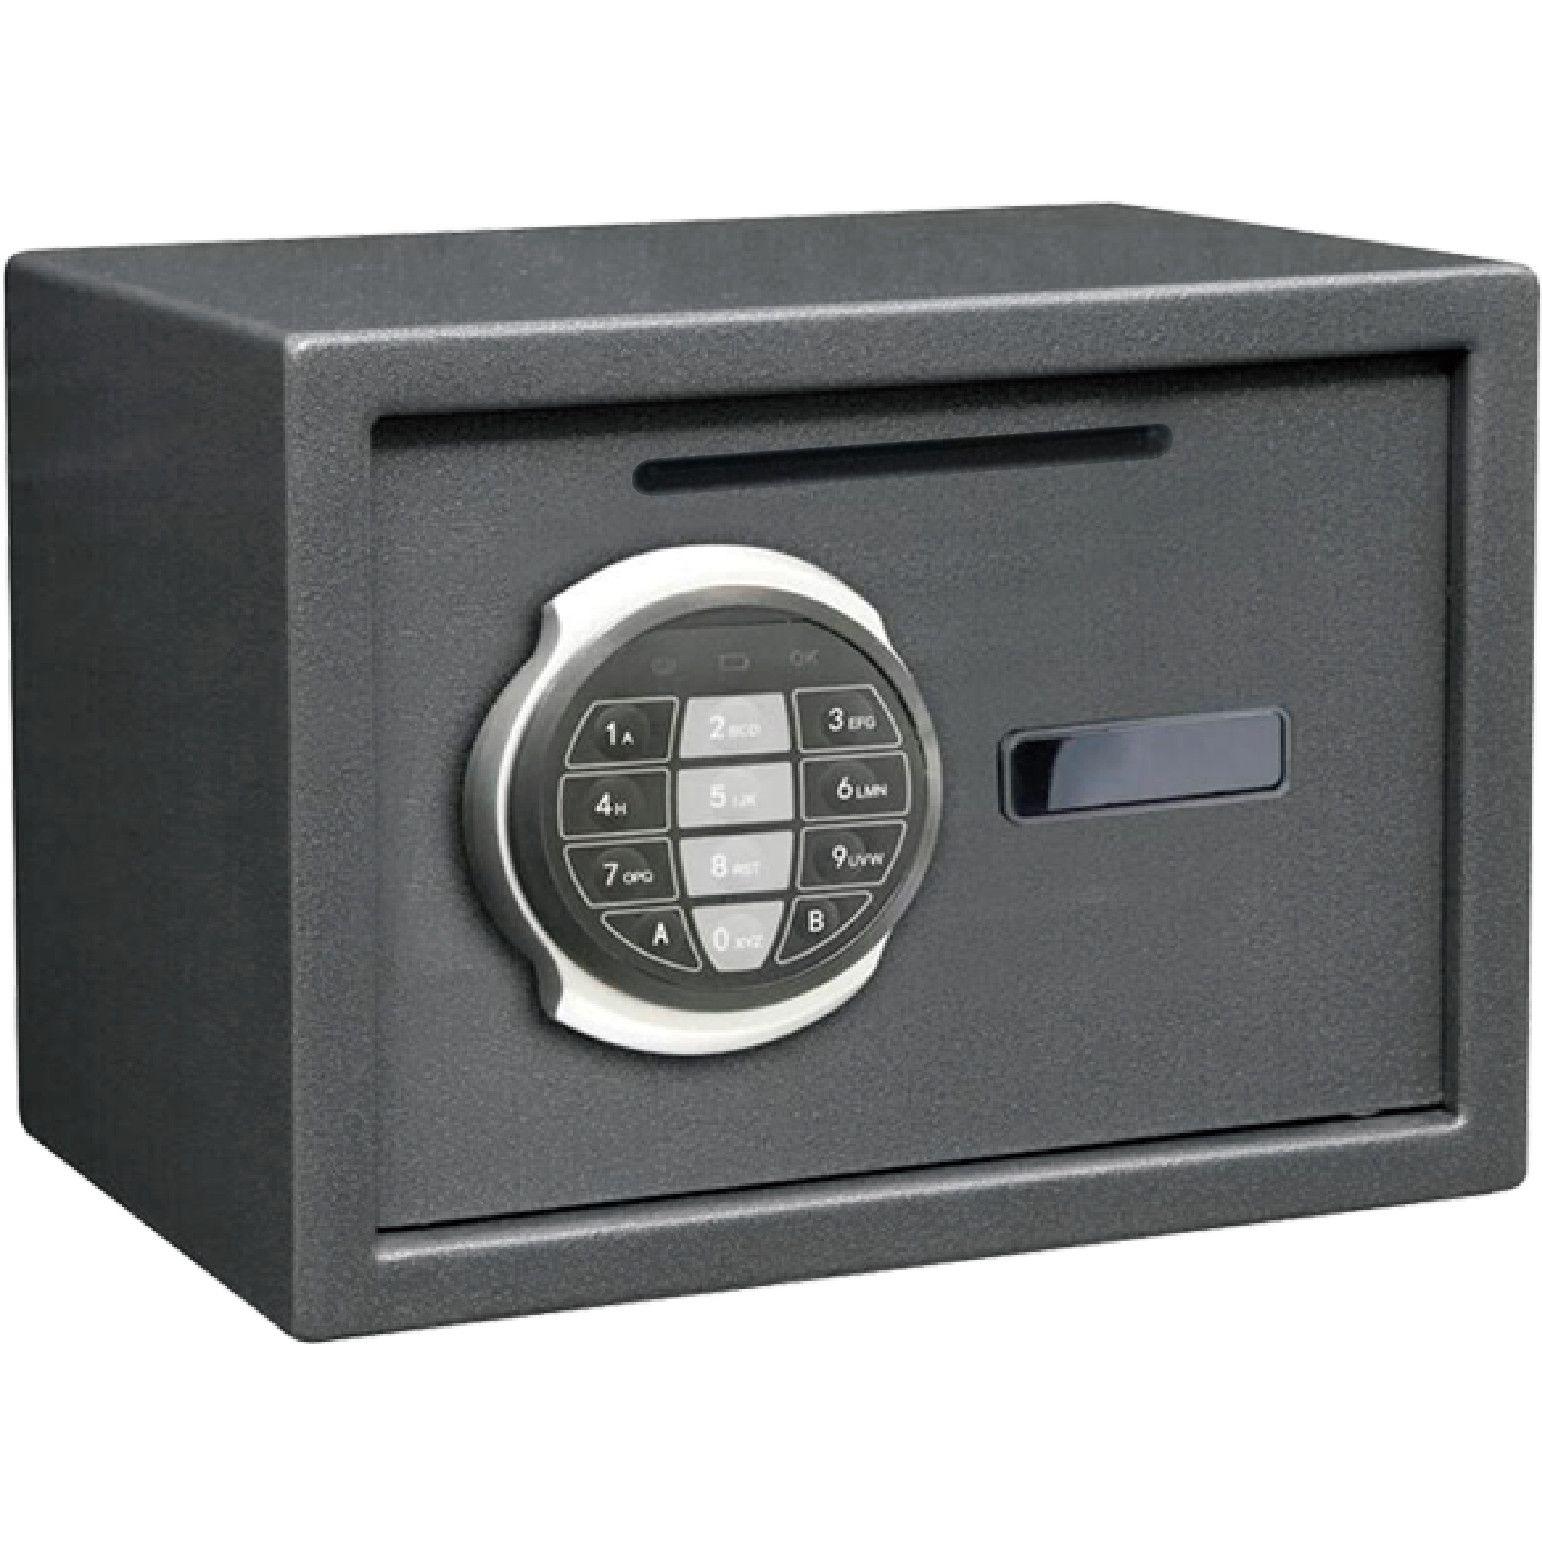 Cofre Eletrônico Safewell 25EL Boca de Lobo Cód Numérico